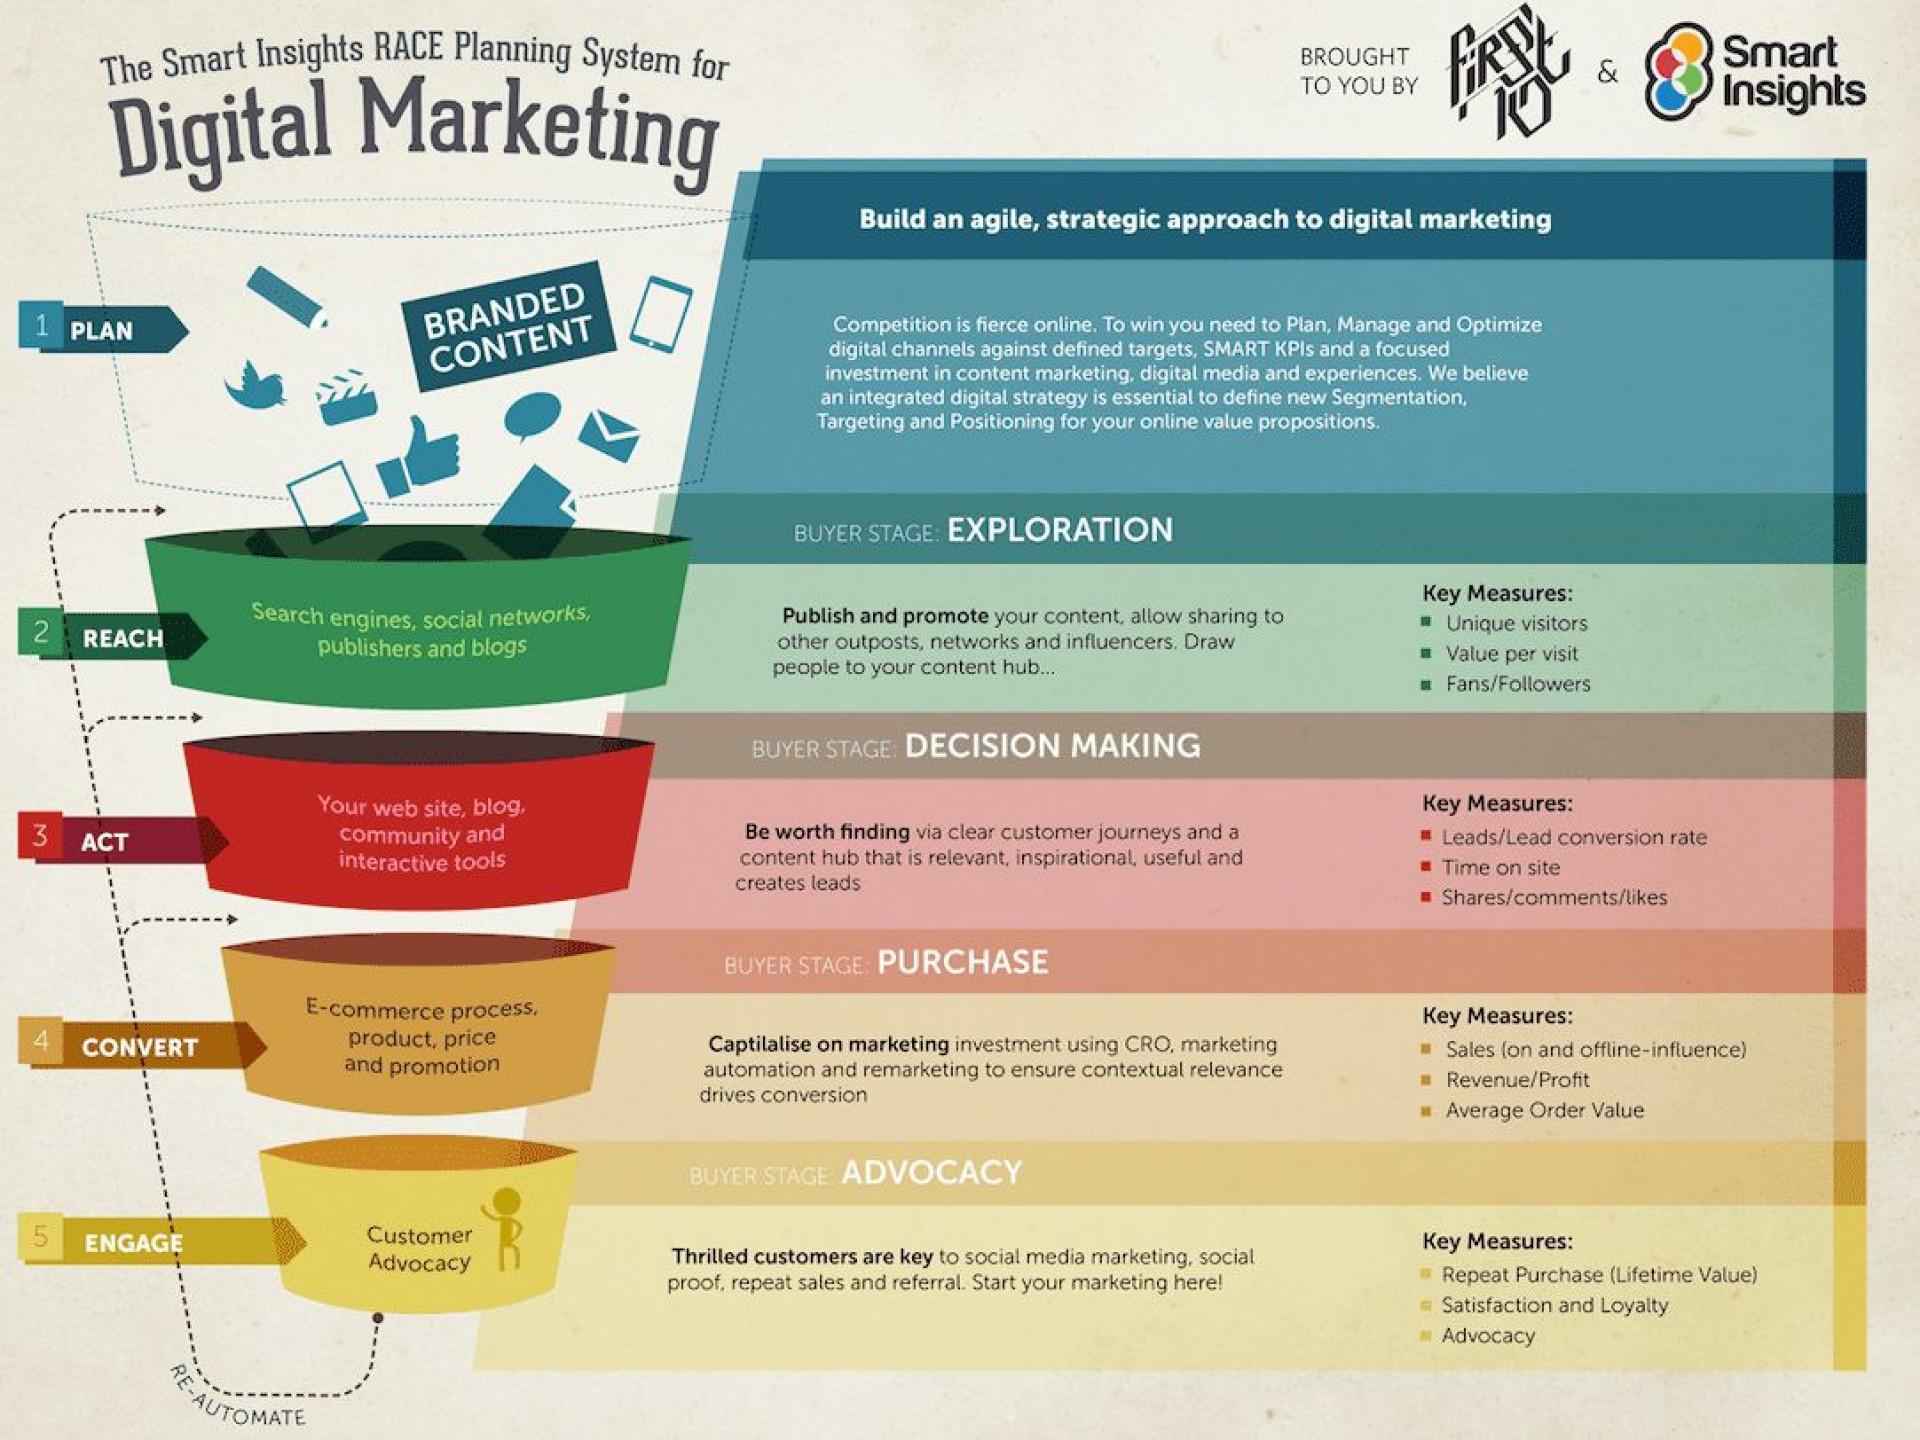 009 Impressive Digital Marketing Plan Template Sample  .xl Doc1920